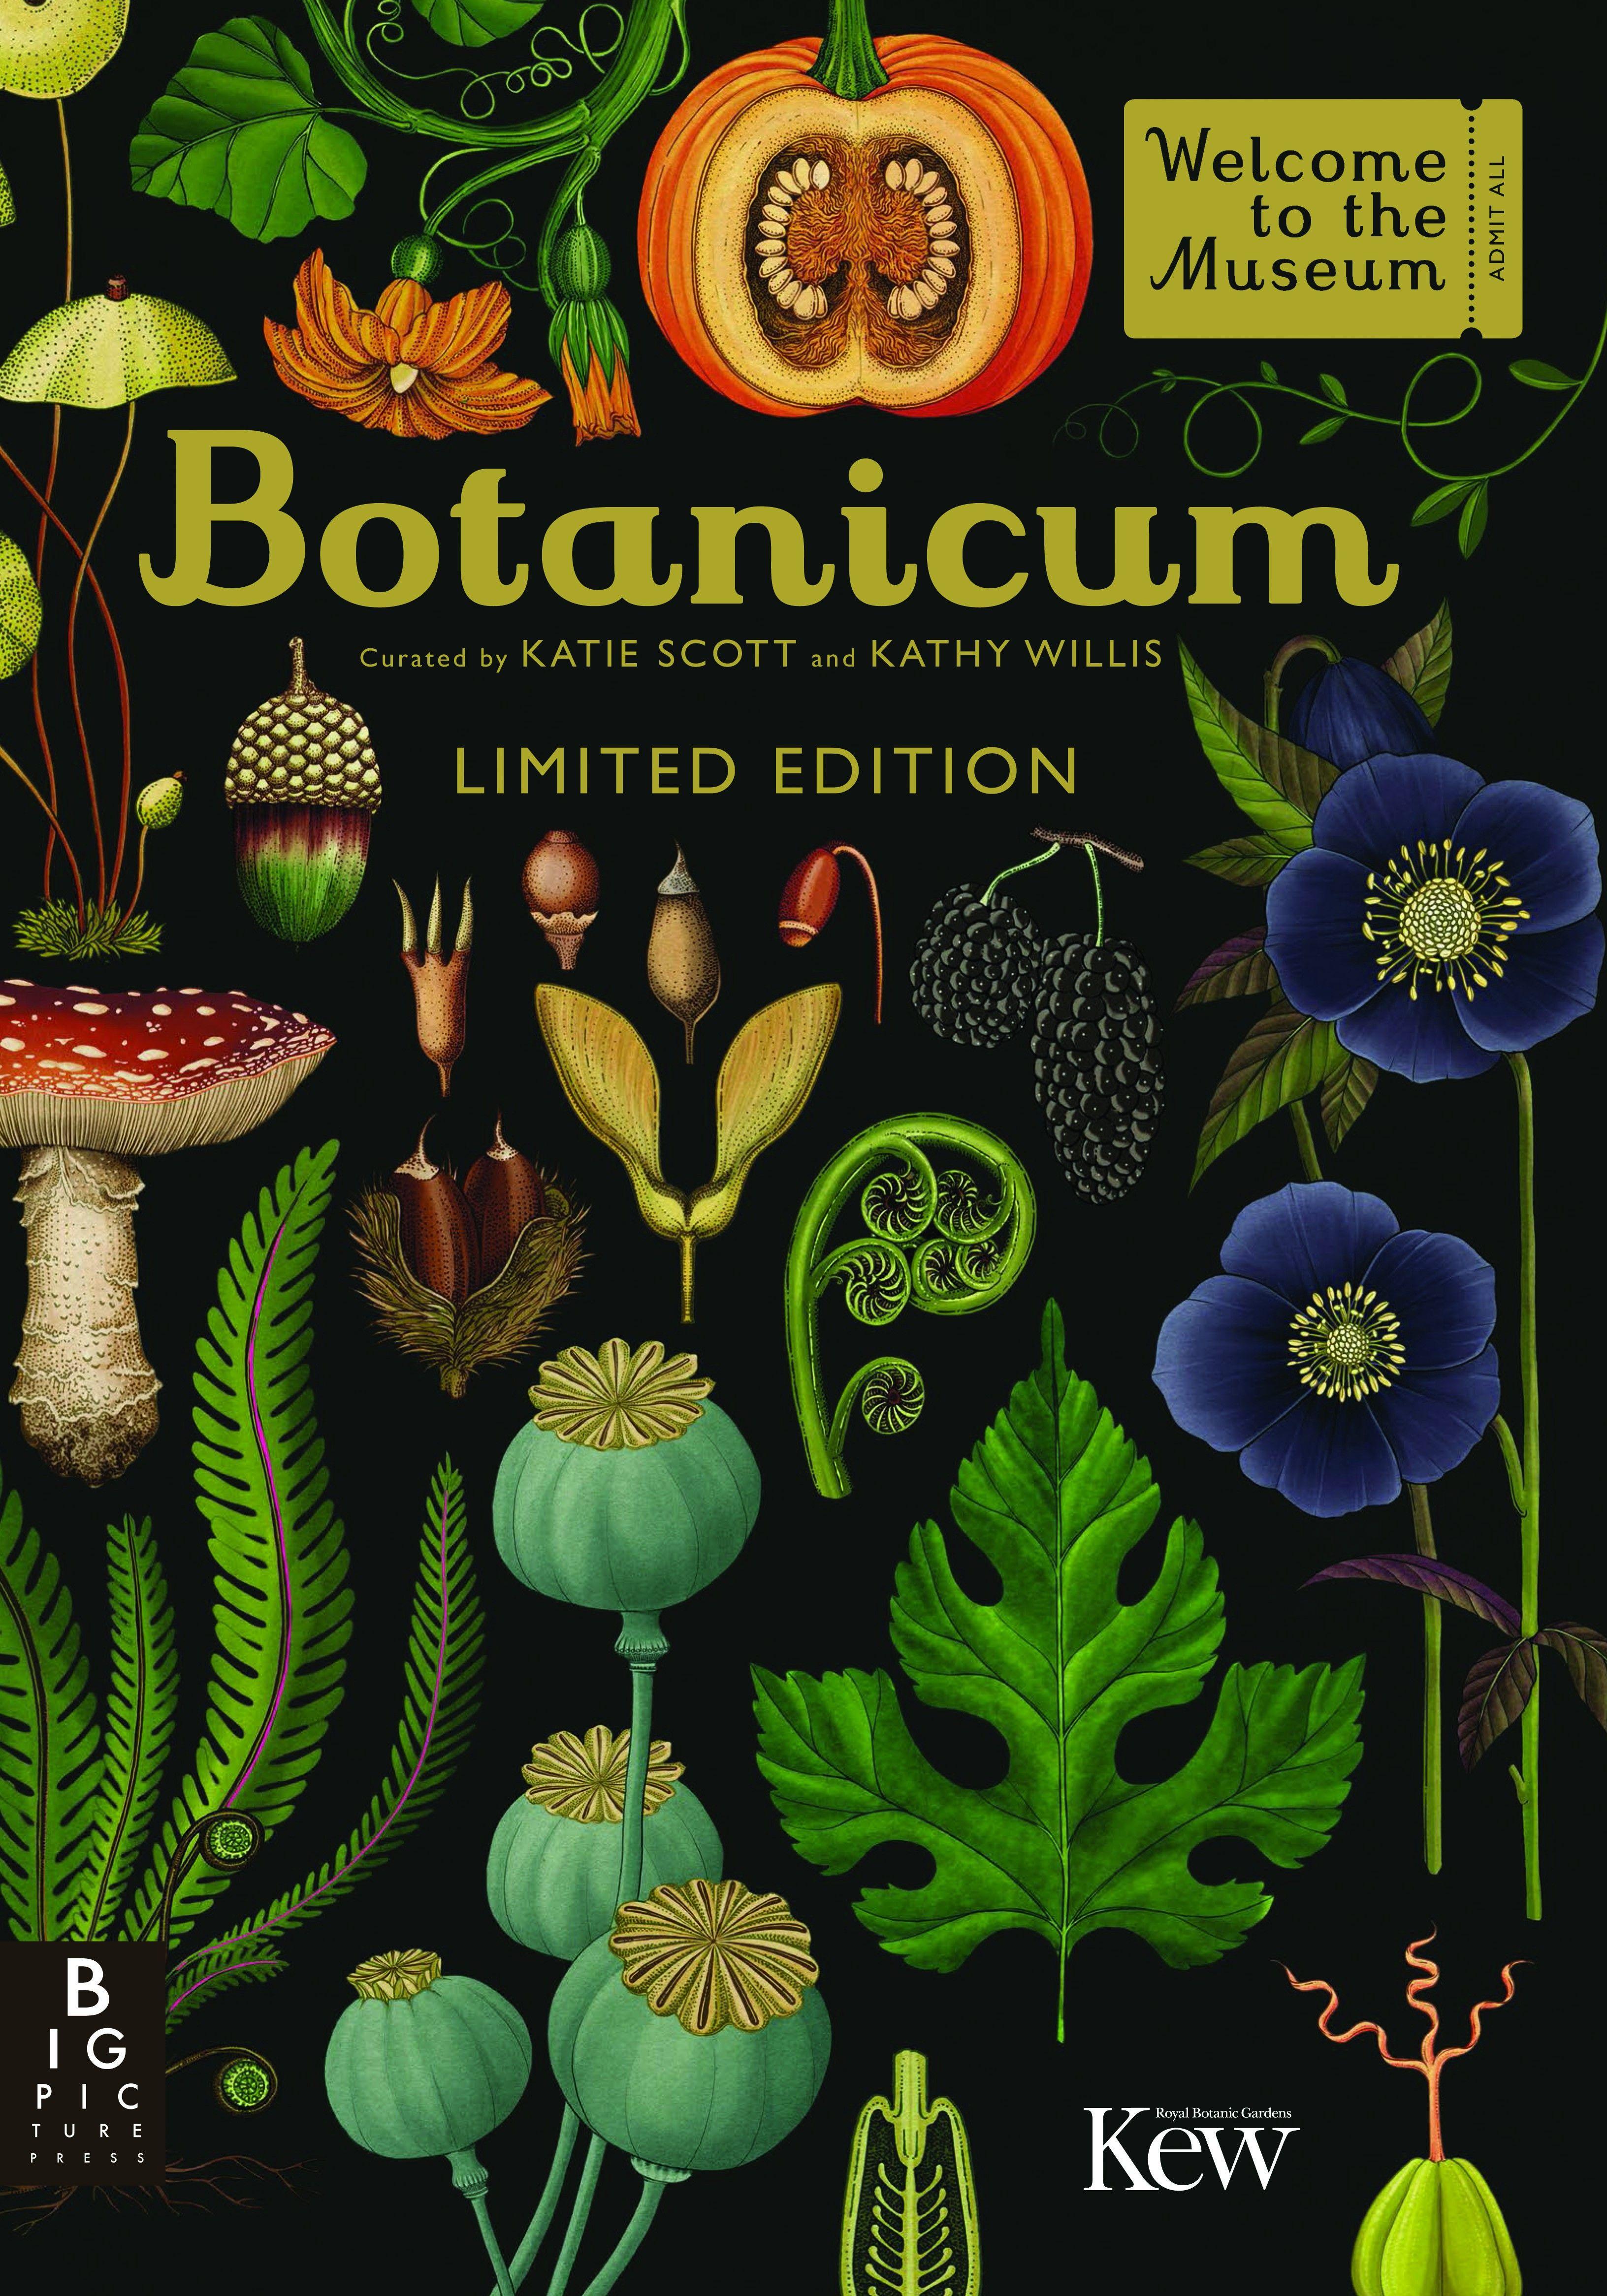 Botanicum (limited edition) | Kew Gardens Shop | Books